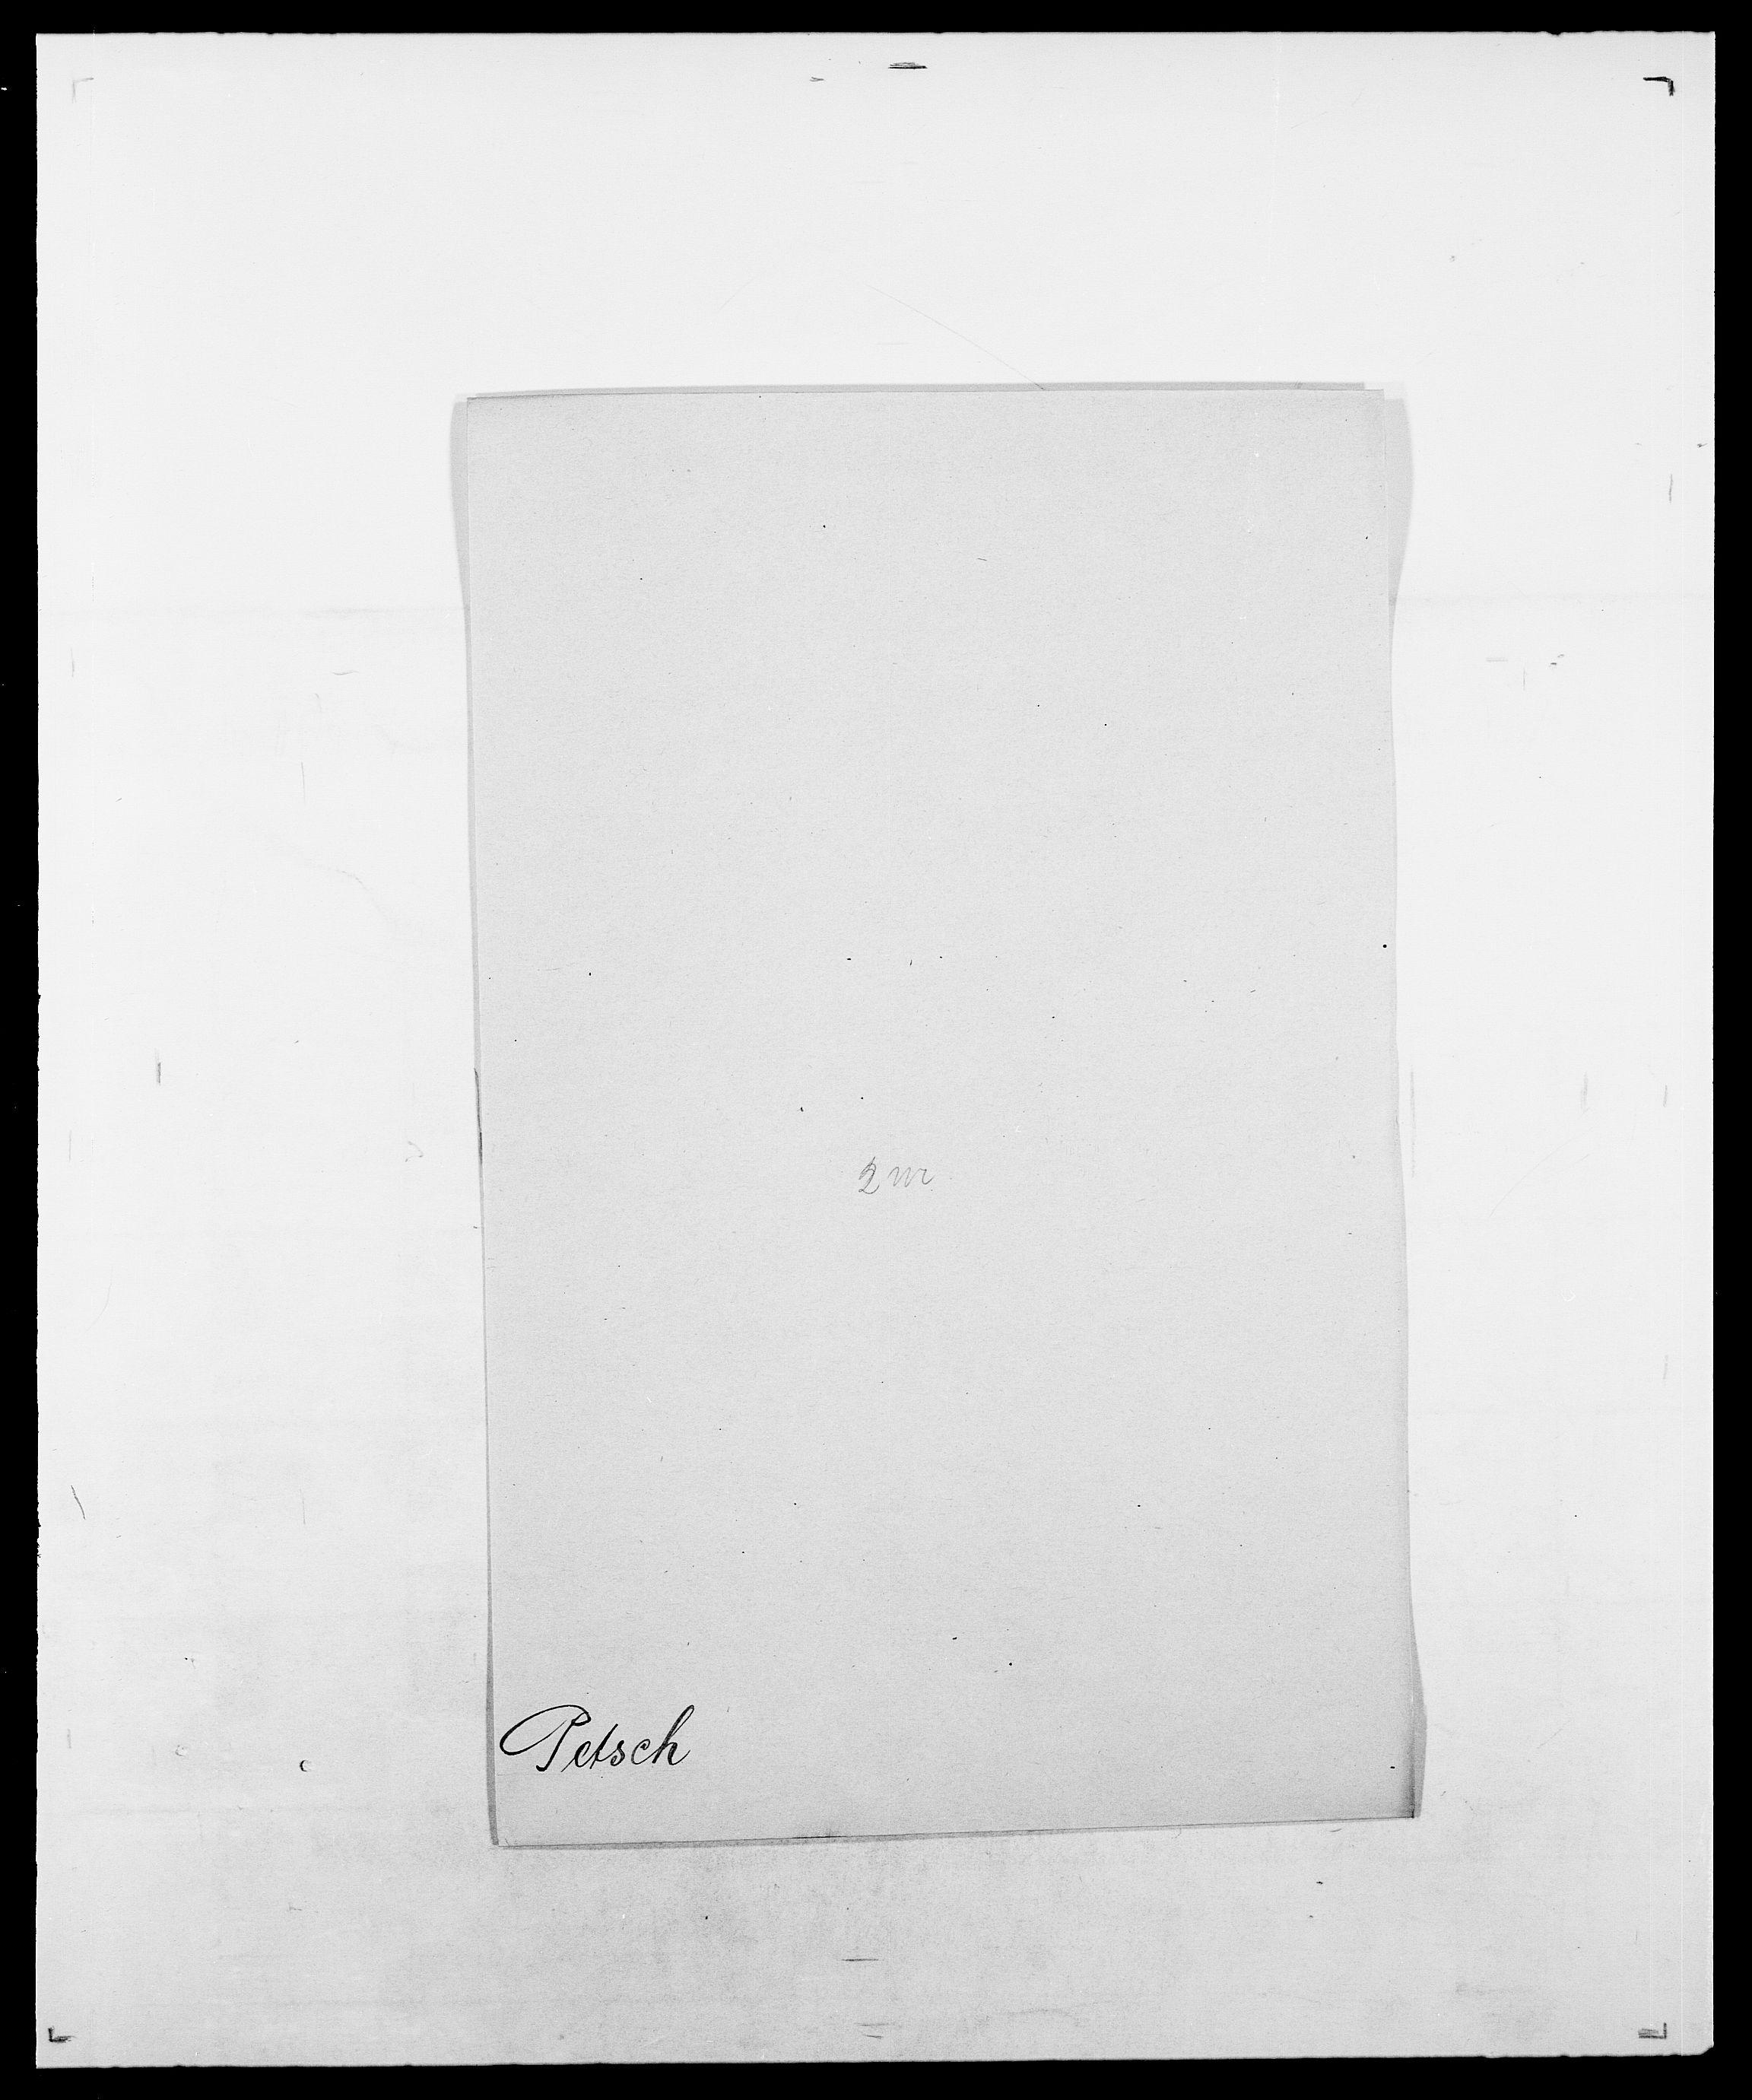 SAO, Delgobe, Charles Antoine - samling, D/Da/L0030: Paars - Pittelkov, s. 463